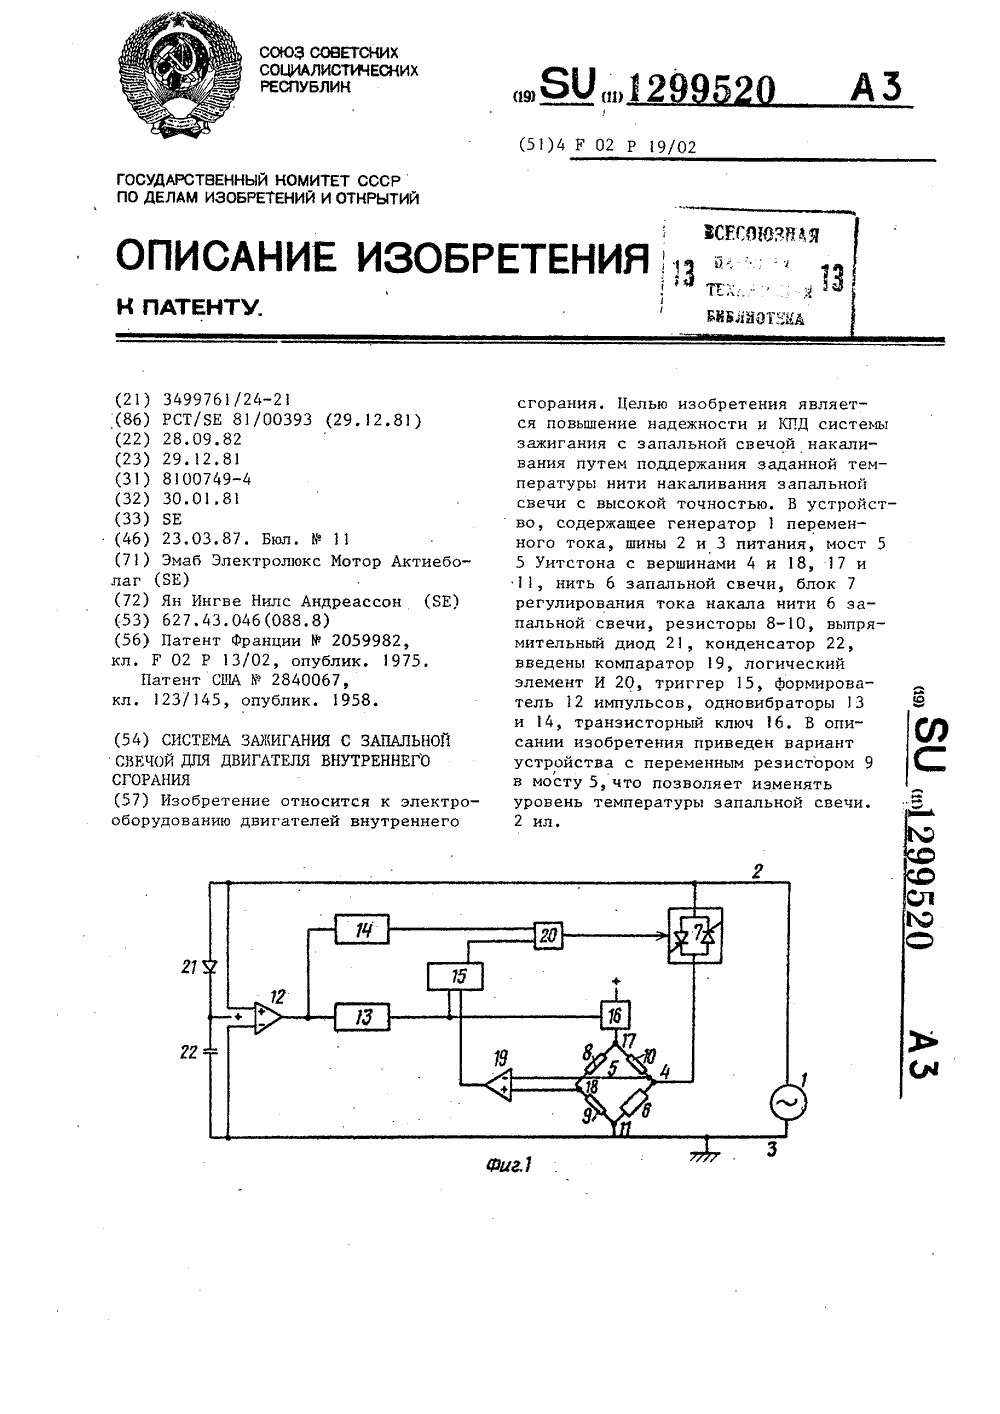 электрофакельная свеча схема пуска